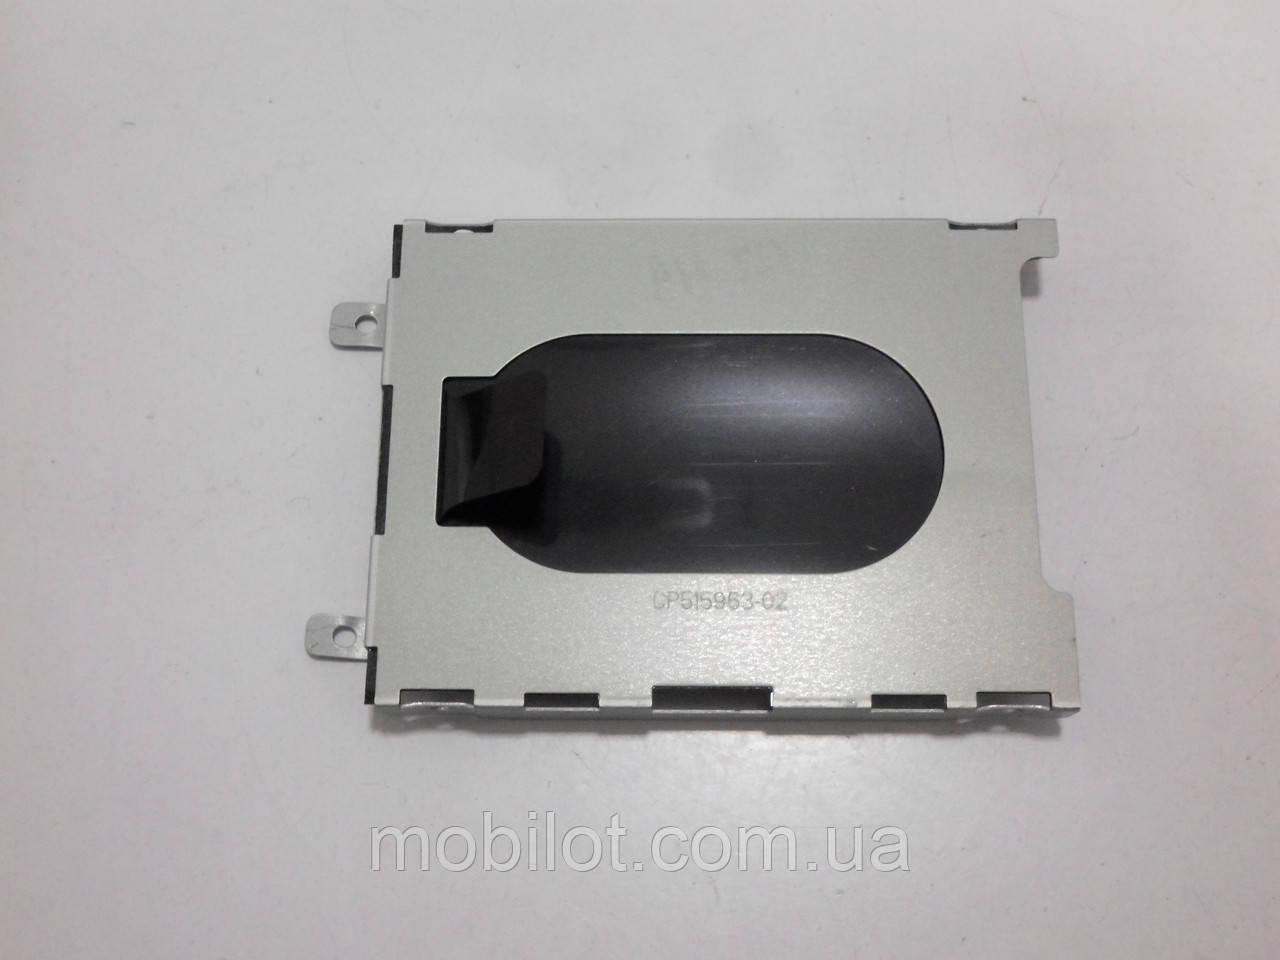 Корпус (карман, корзина, крепление) для HDD Fujitsu AH531 (NZ-8066)